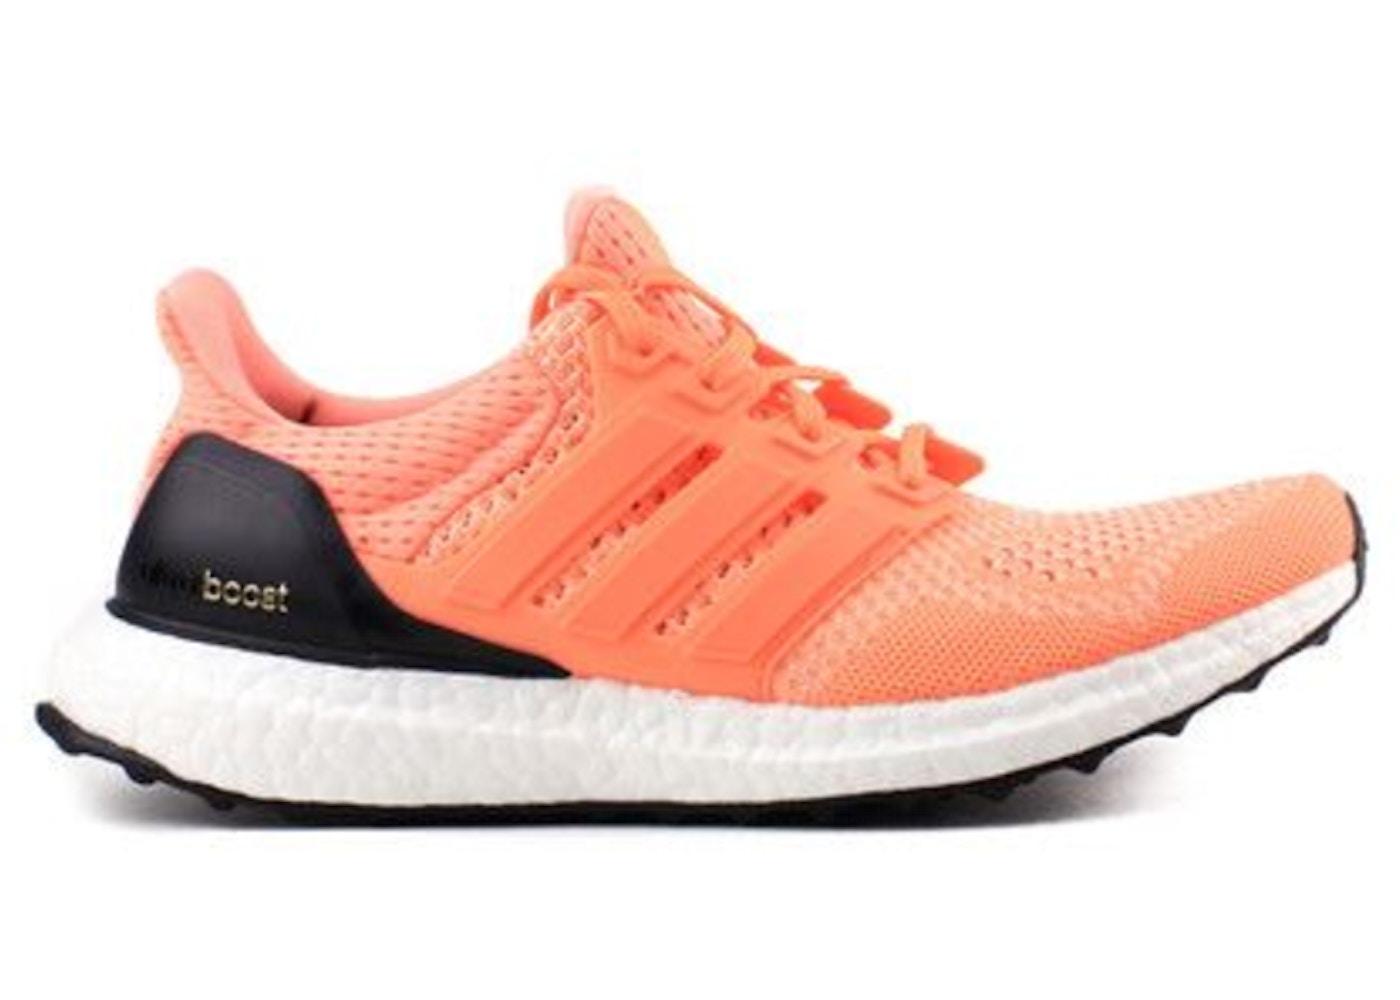 Adidas ultraboost 1.0 flash pink original, Women's Fashion